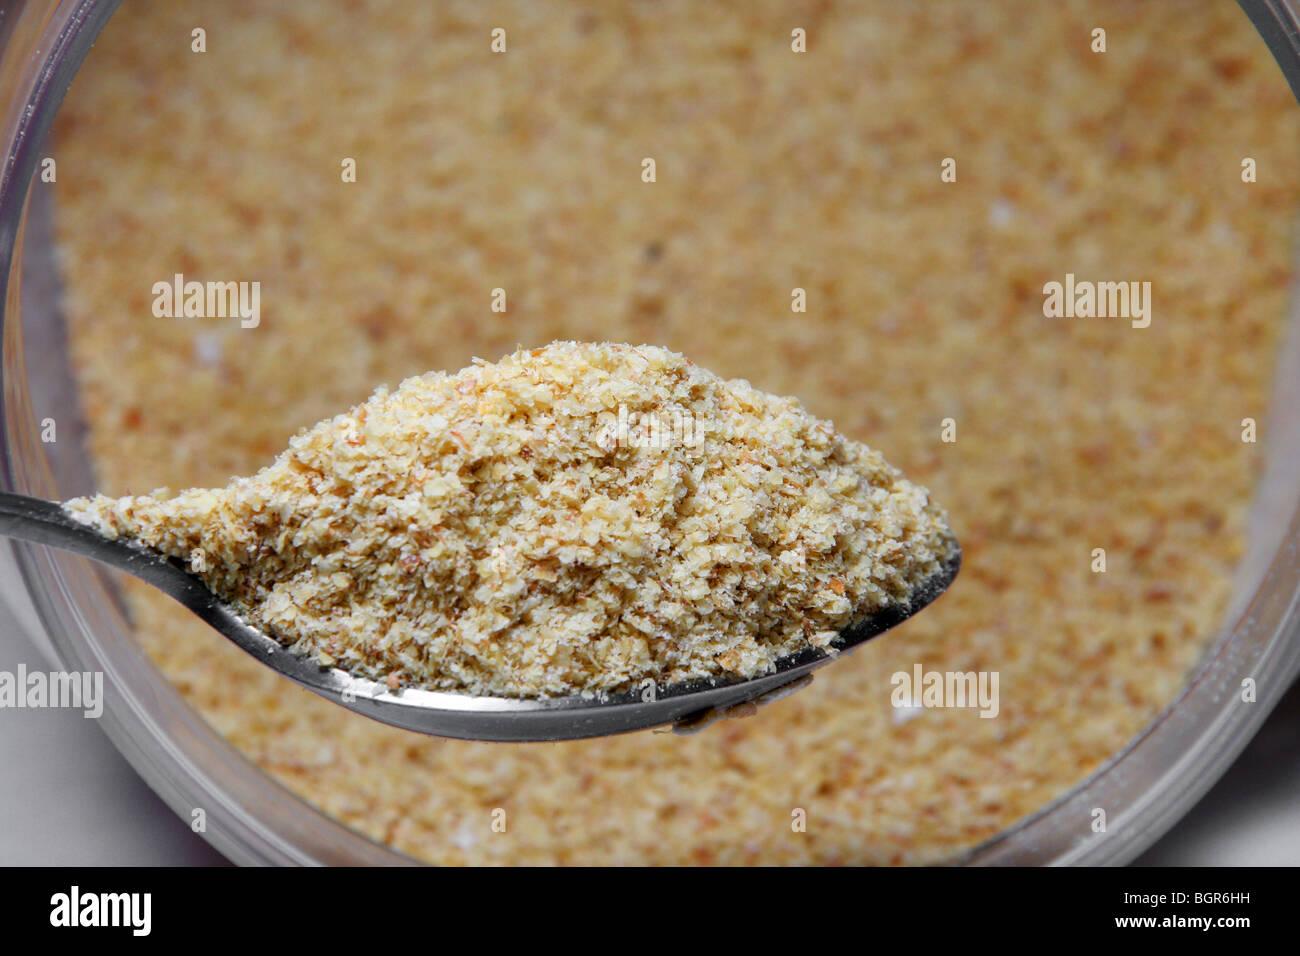 Wheat germ. - Stock Image